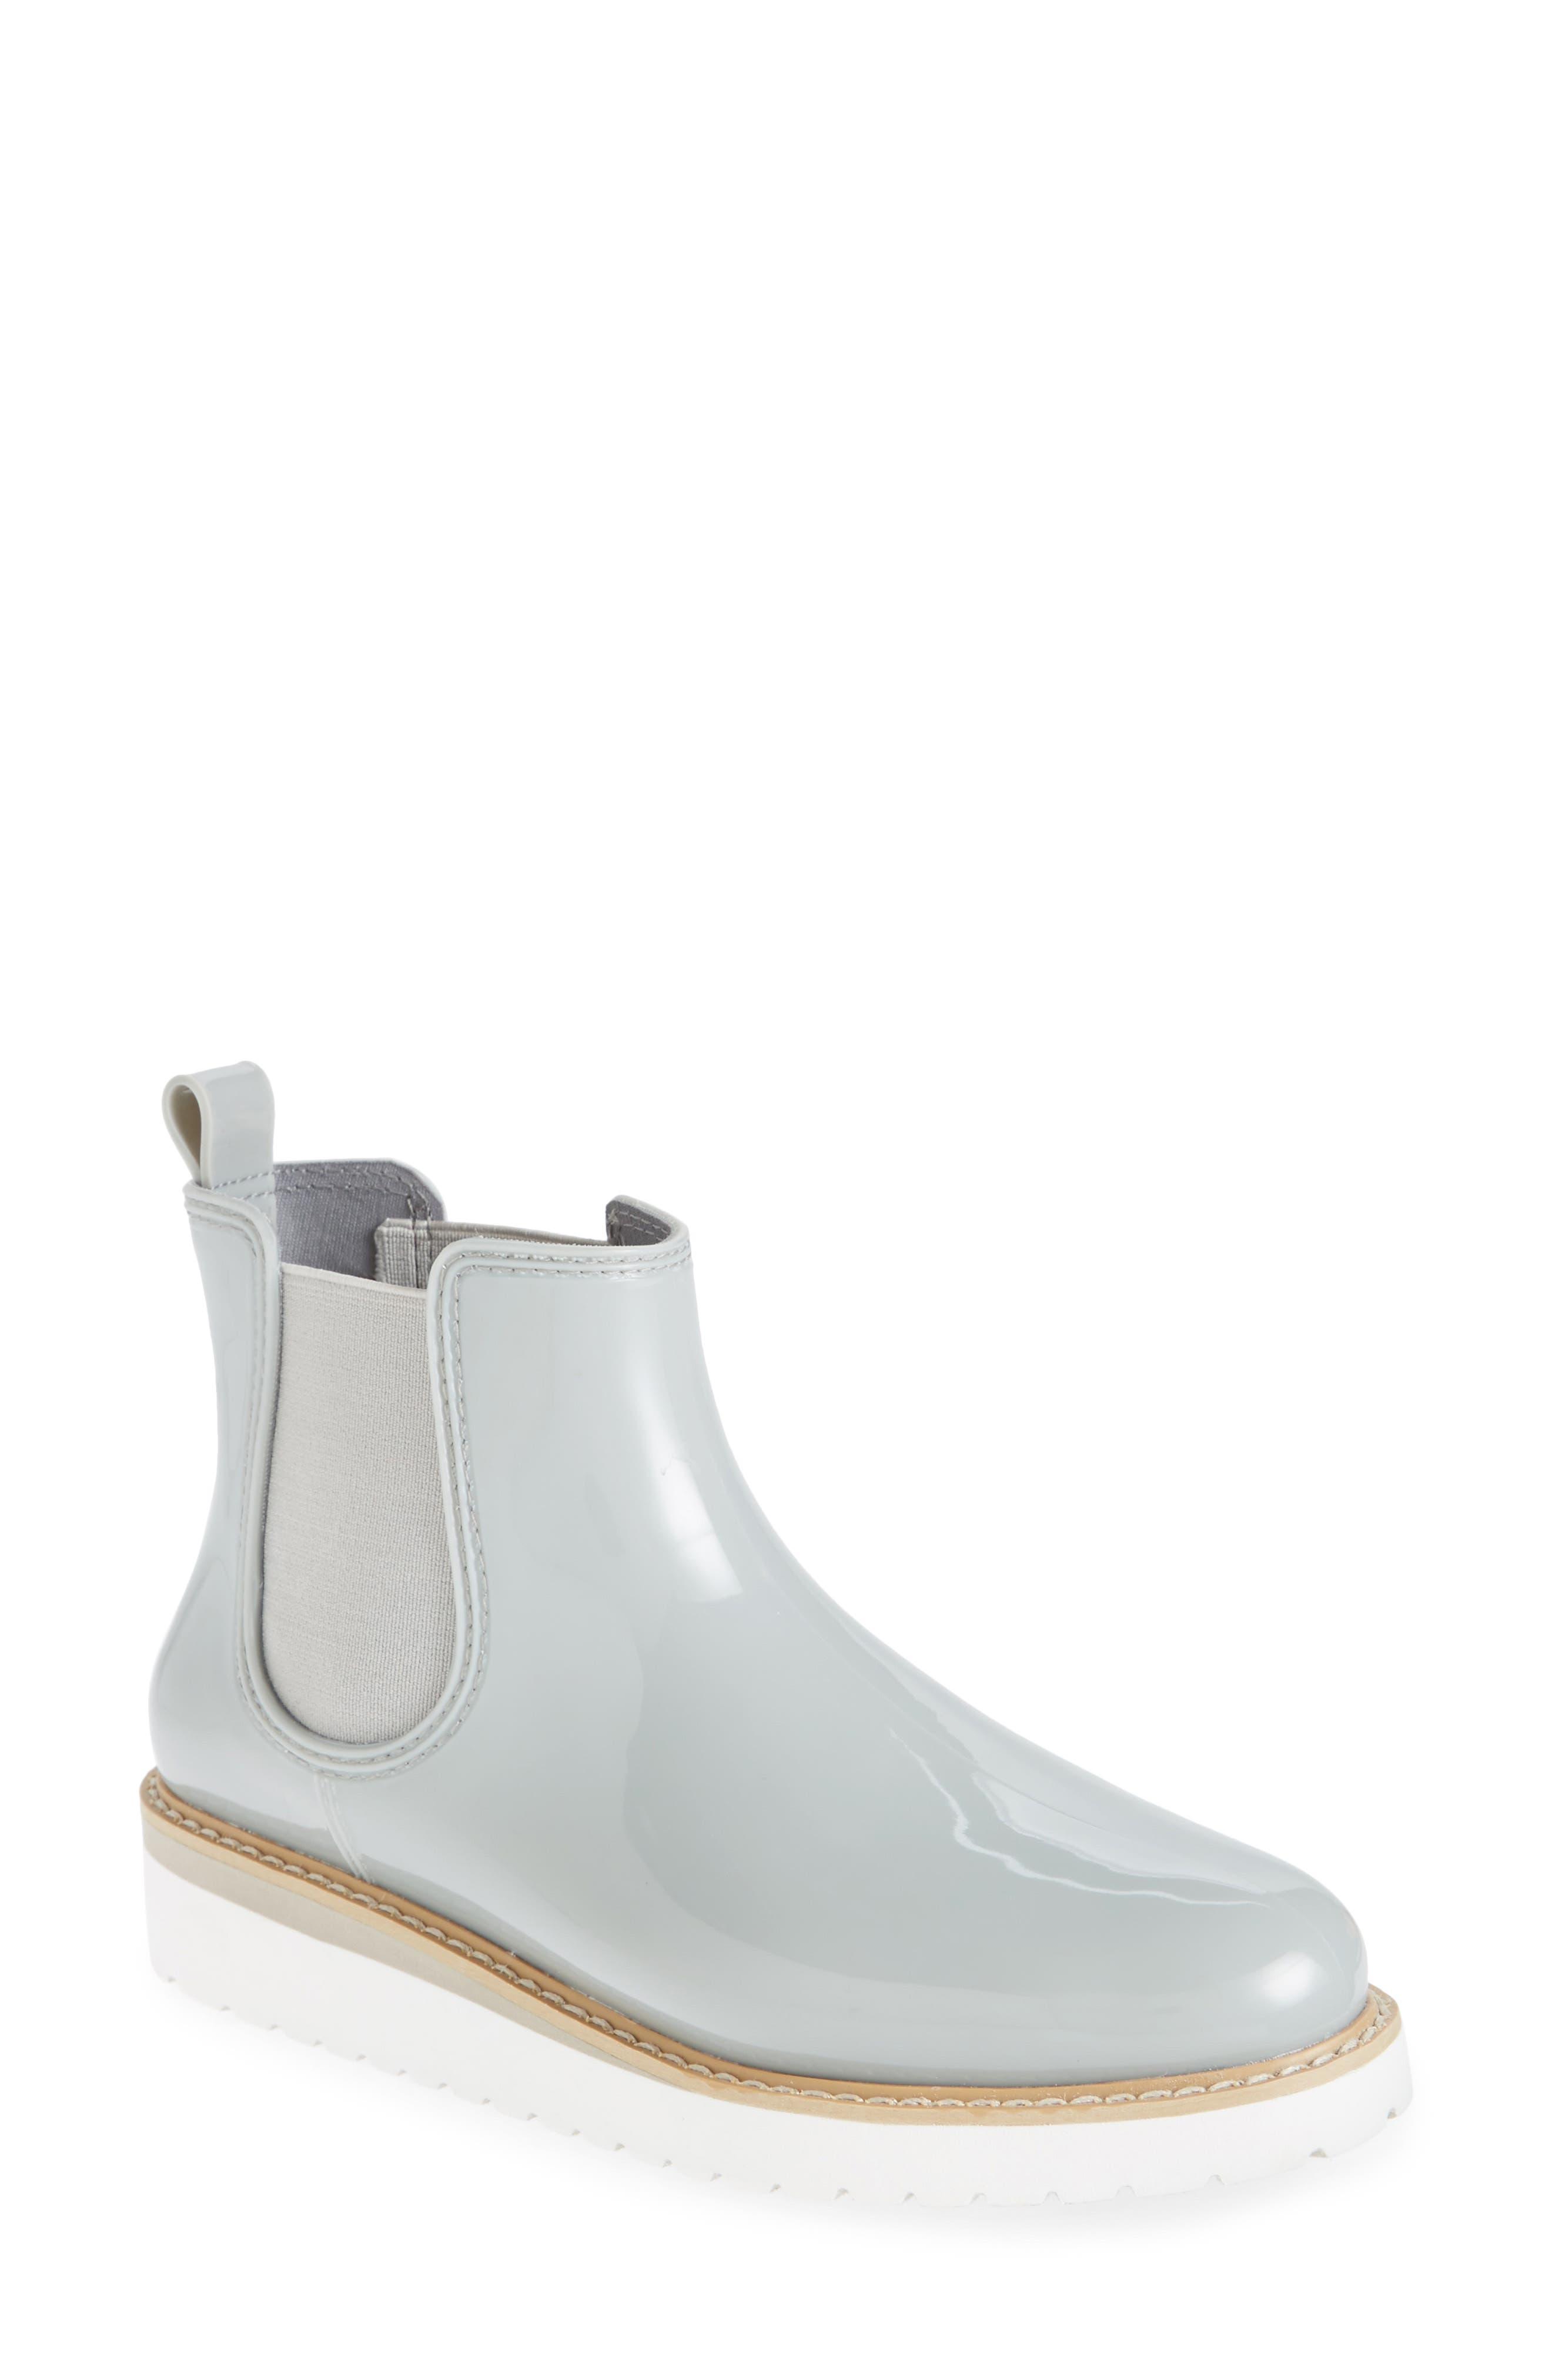 Kensington Chelsea Rain Boot